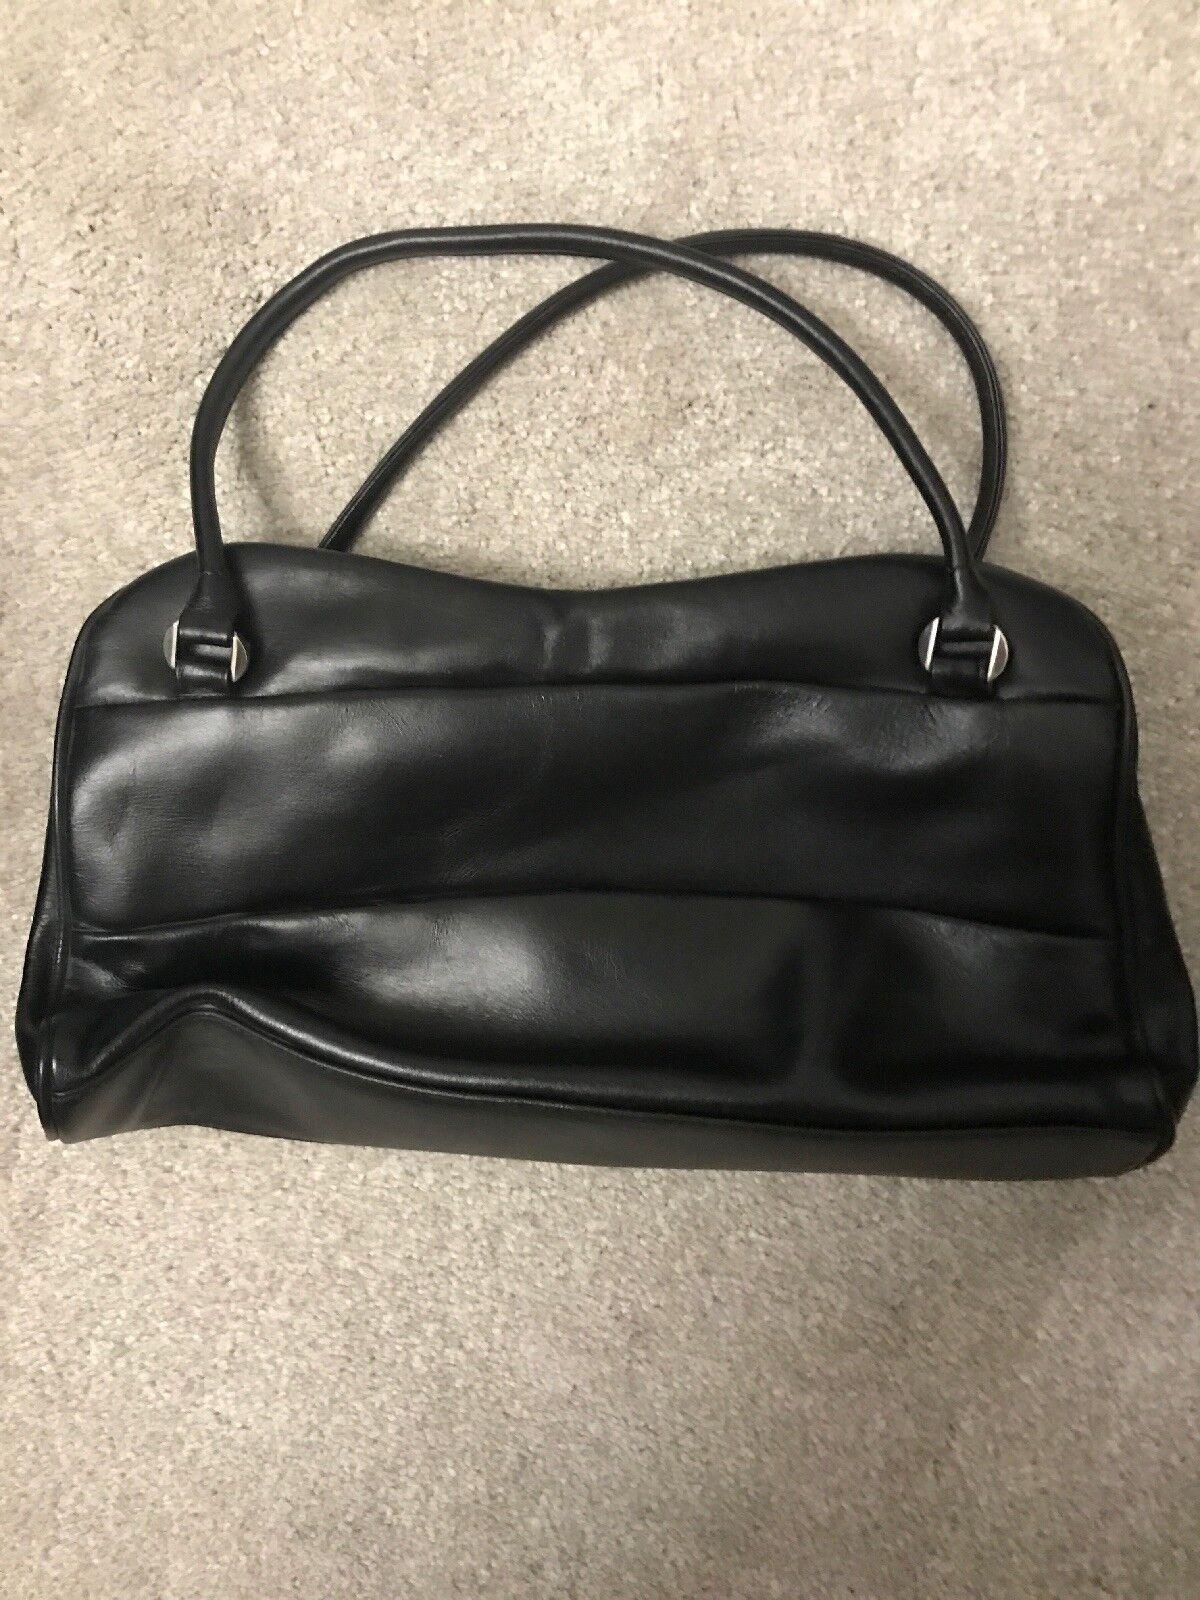 Jane Shilton Black Leather Handbag for sale online  ff0c9105b33f0